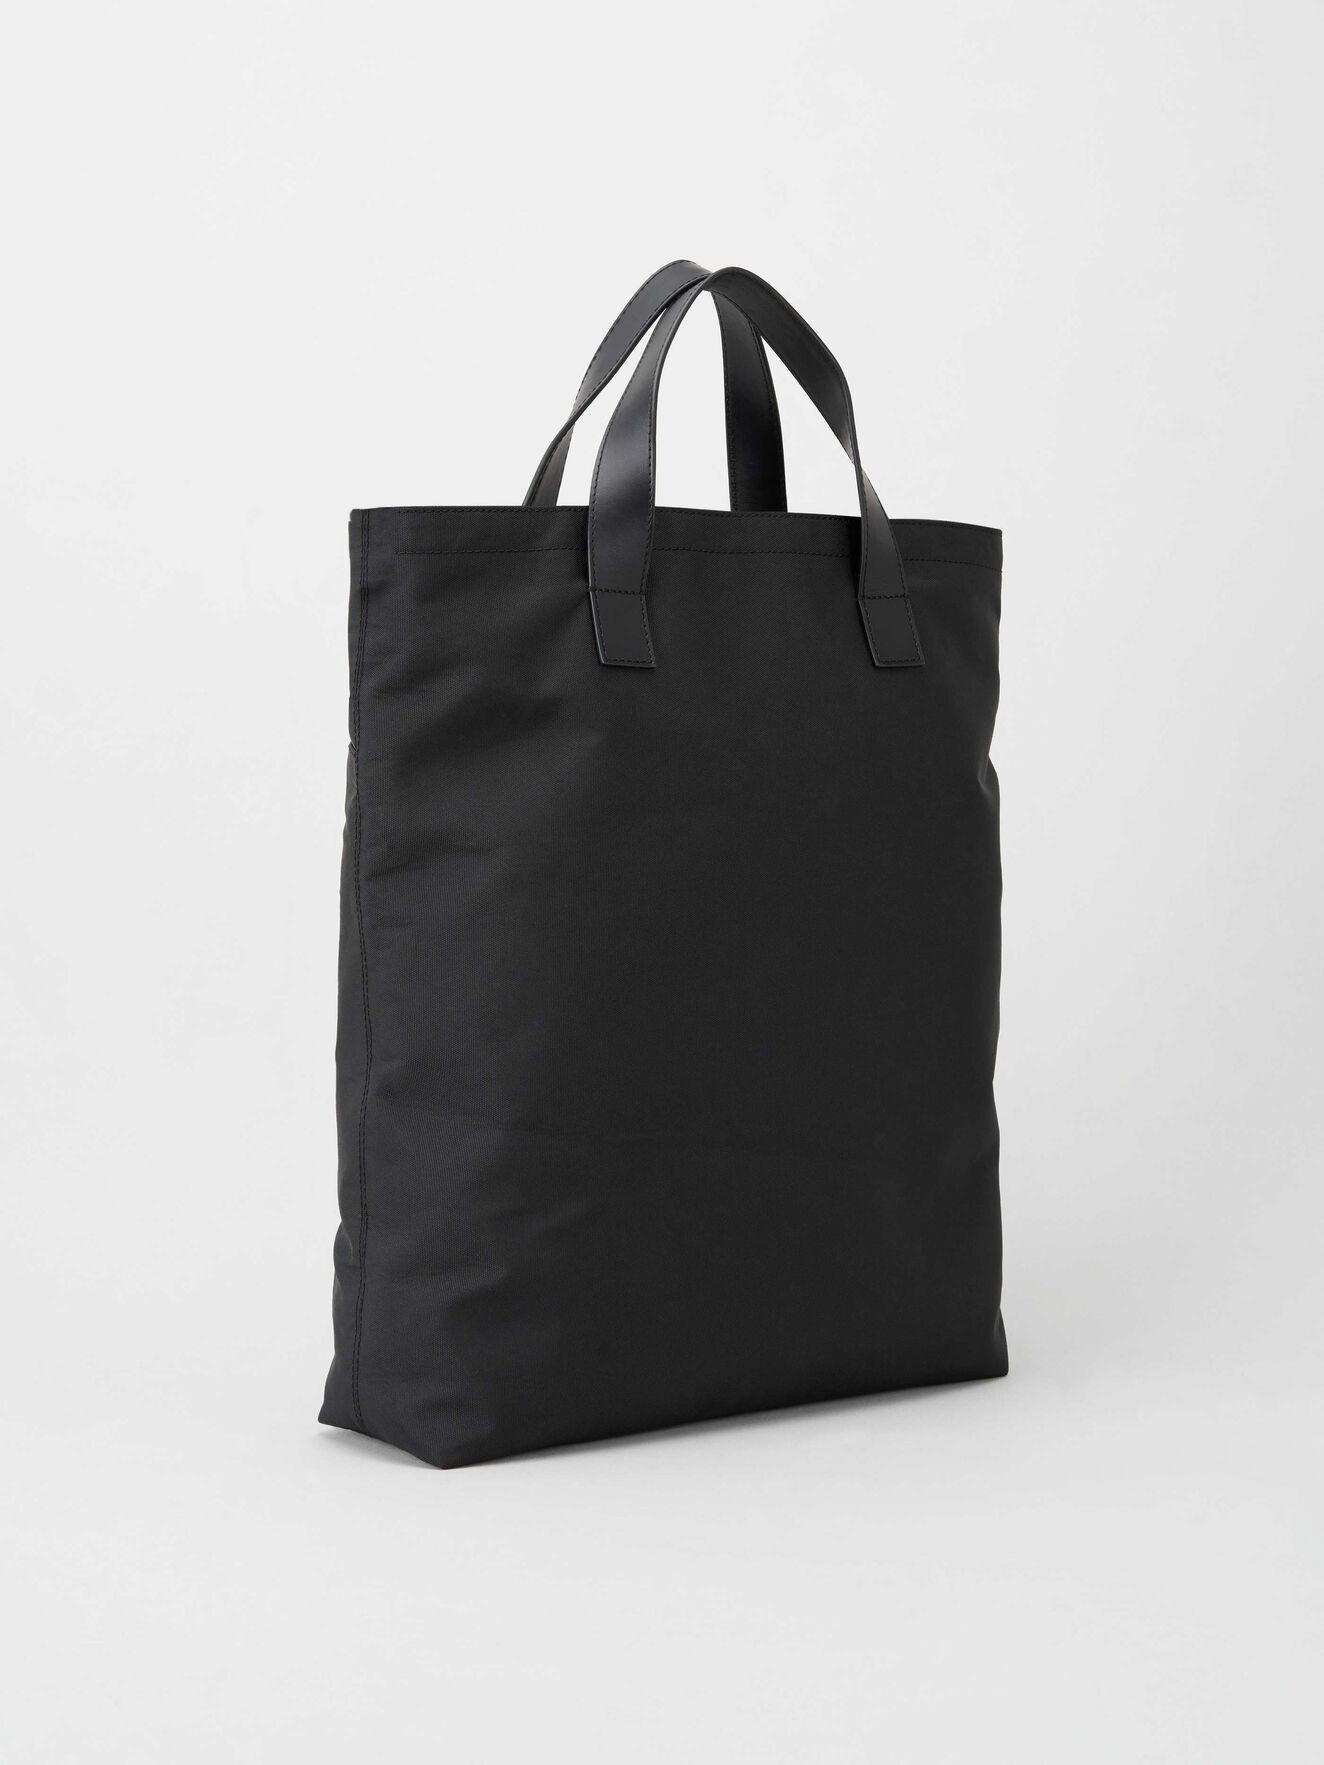 Lumberjack Bear Ornaments Reusable Reversible Washable Multi-use Cotton Tote Shopping Bag